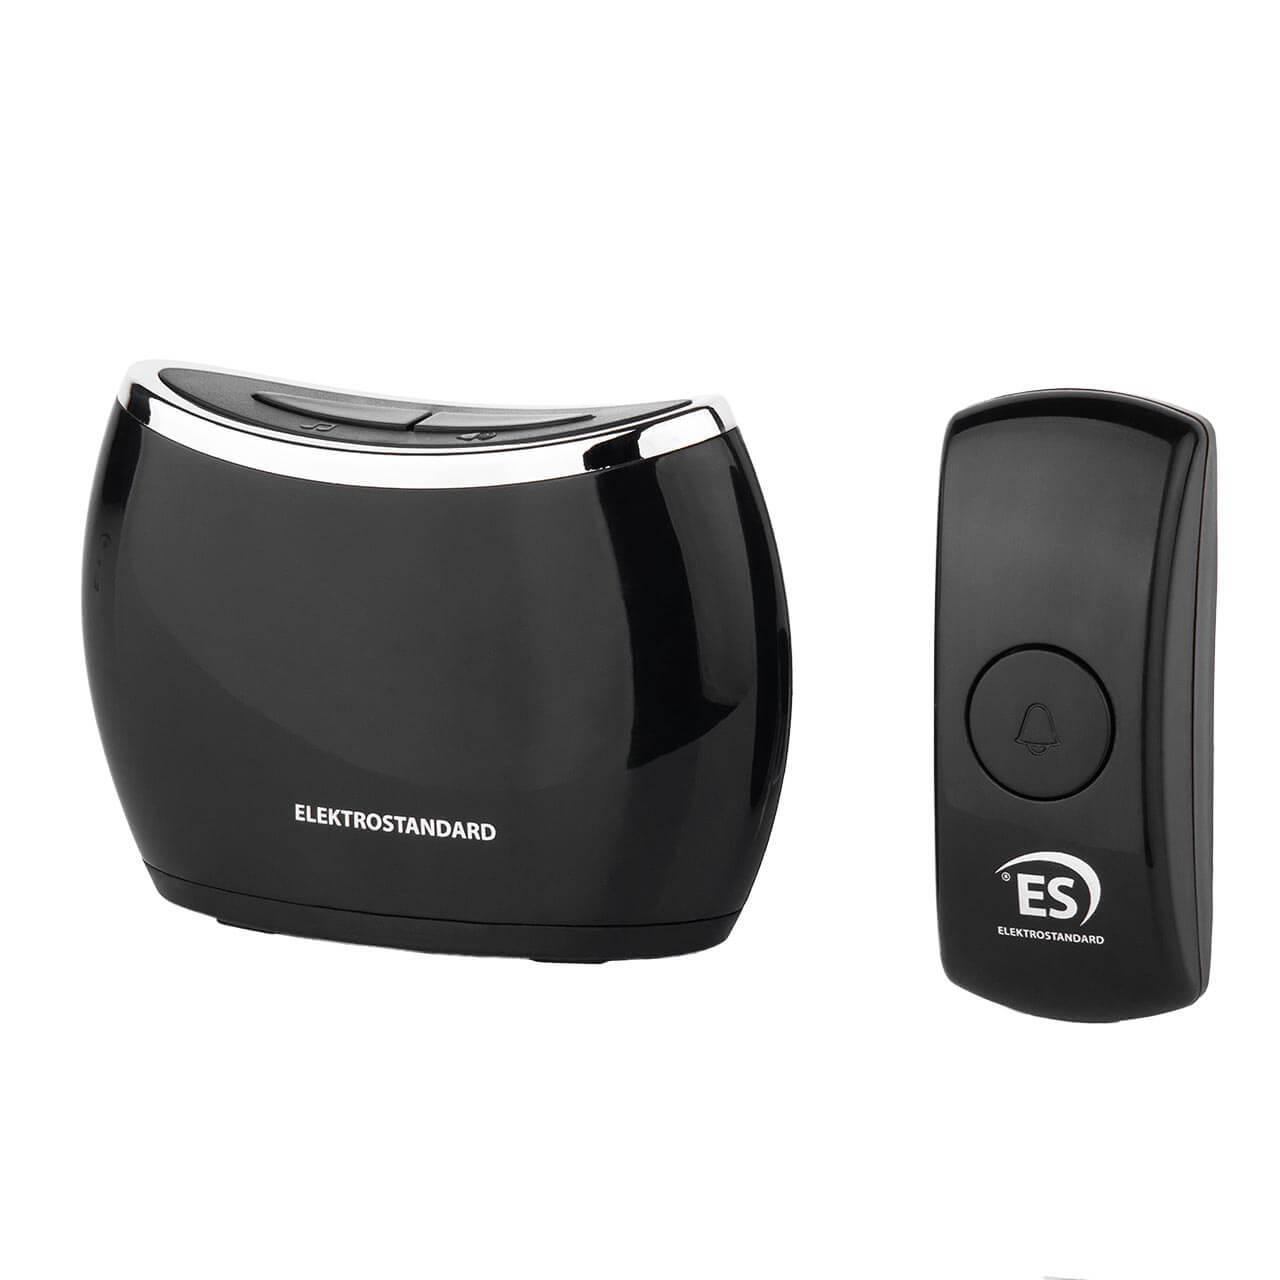 Звонок беспроводной Elektrostandard DBQ21M WL 32M IP44 черный 4690389144912